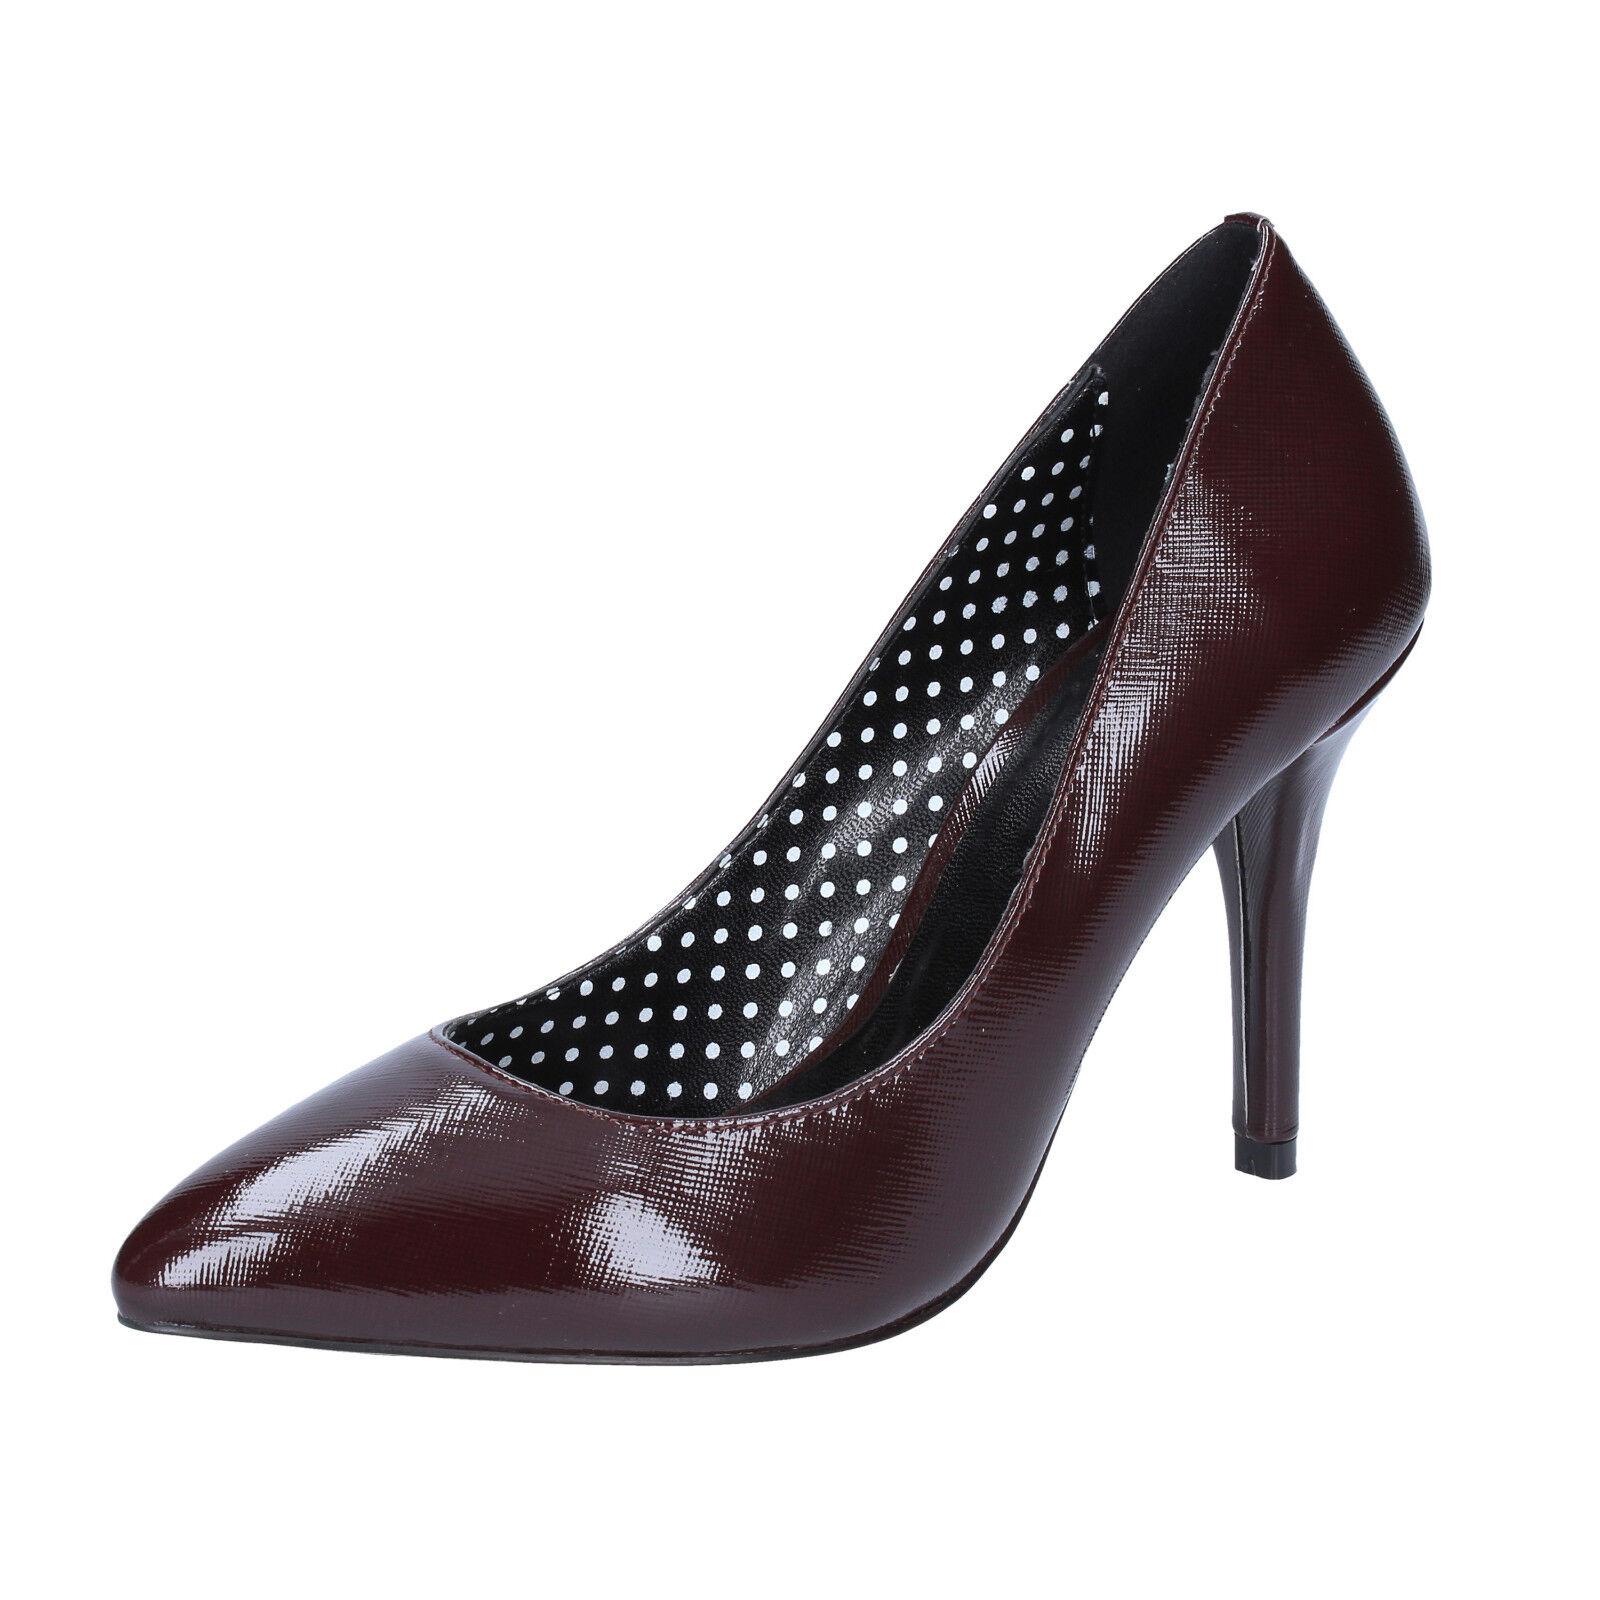 scarpe donna FORNARINA 37 EU BX89-37 decolte bordeaux pelle lucida BX89-37 EU feae16